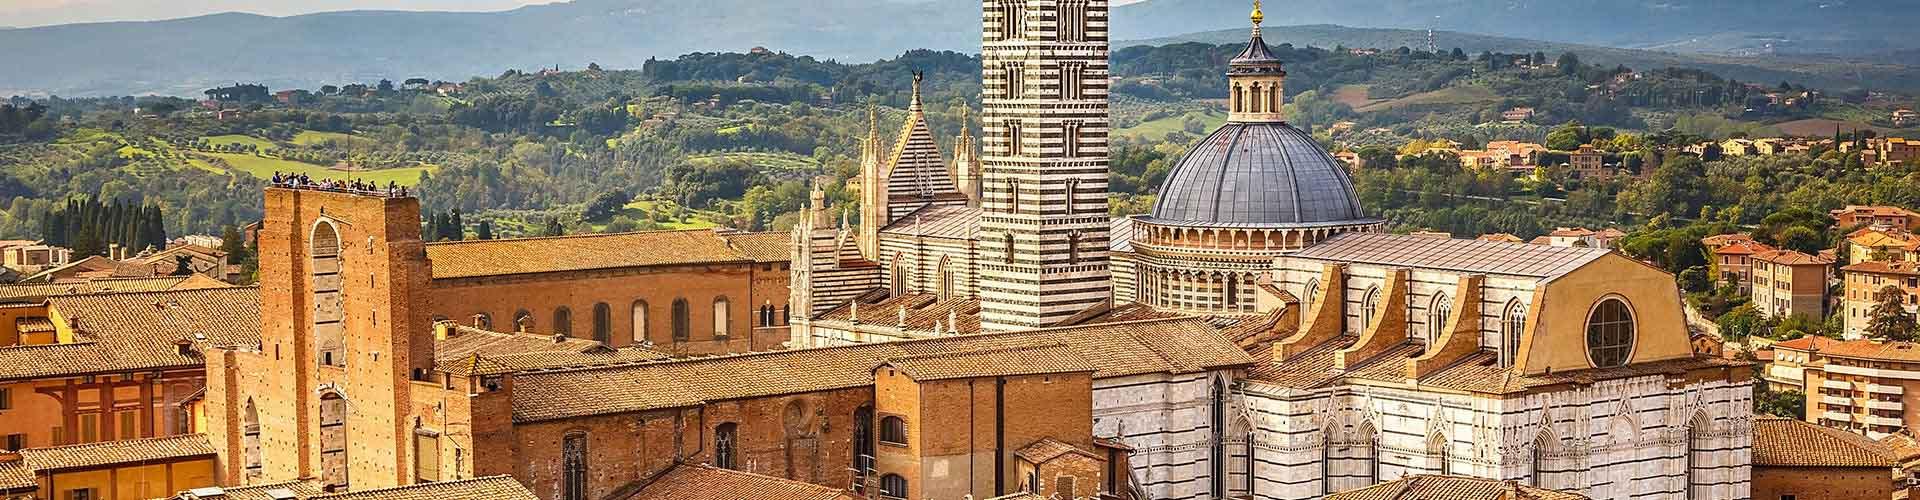 Siena - Apartamentos en Siena. Mapas de Siena, Fotos y comentarios de cada Apartamento en Siena.